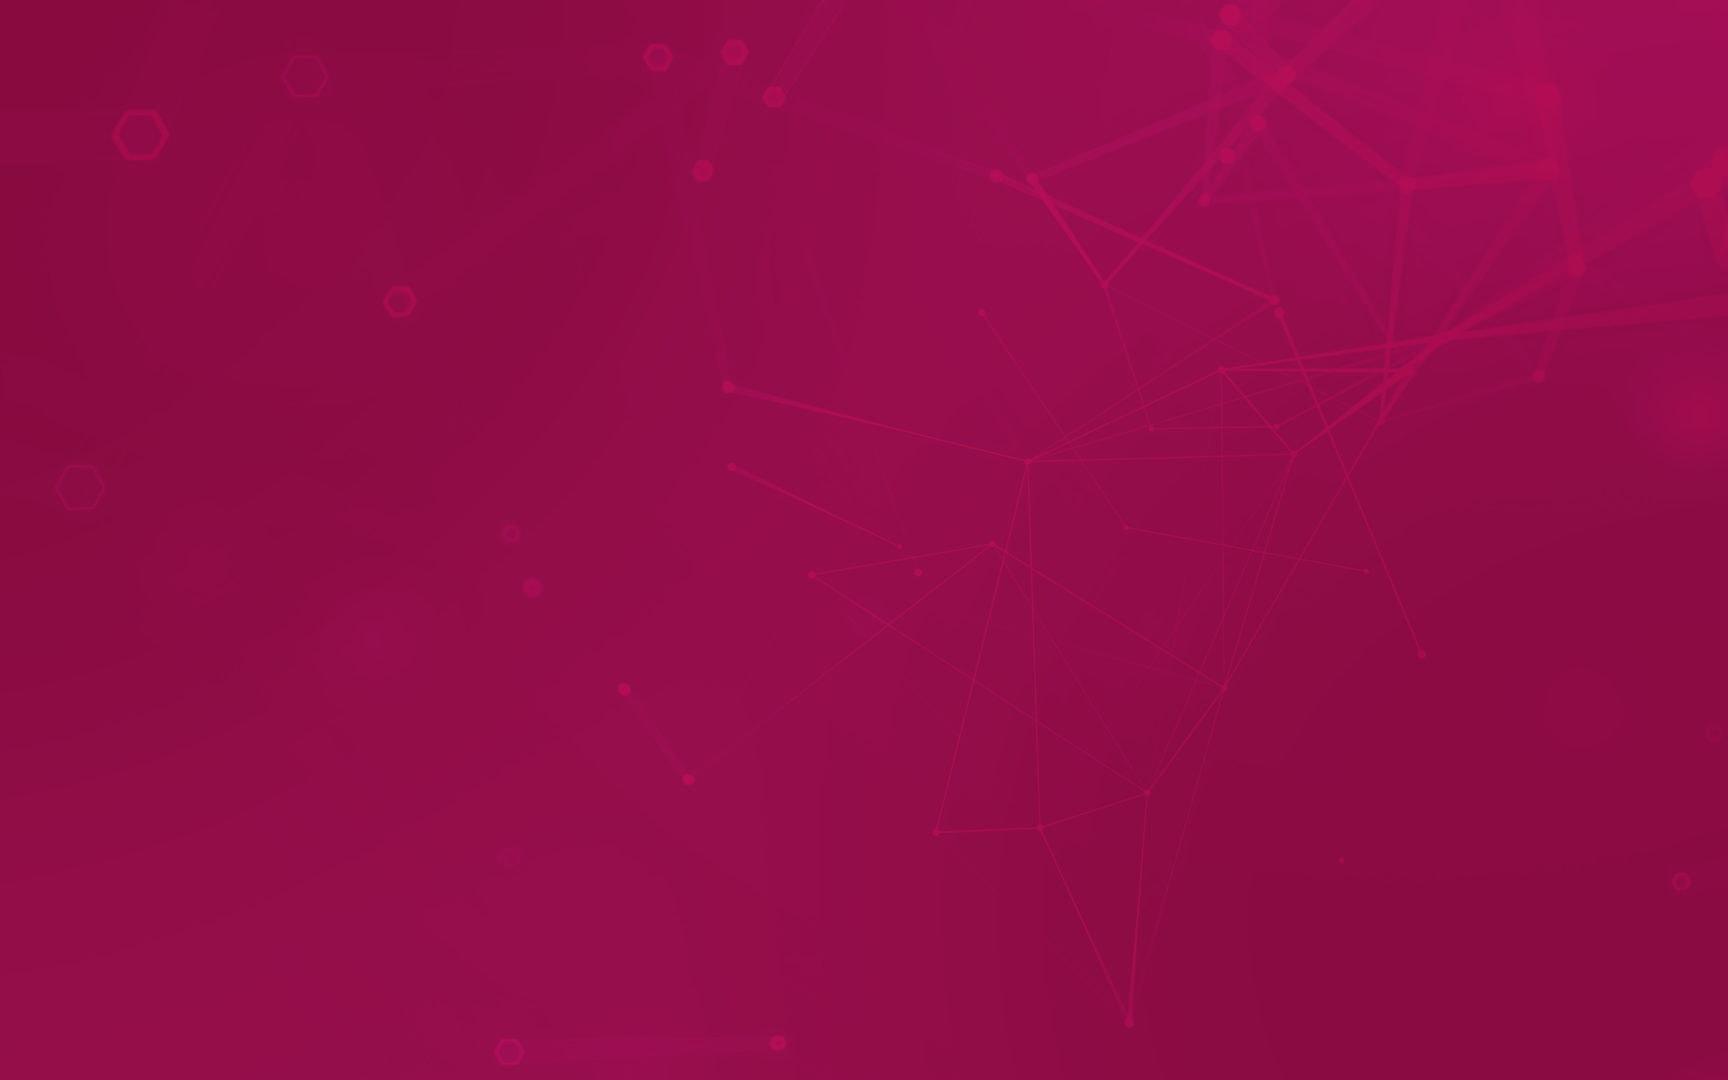 Pink News Background